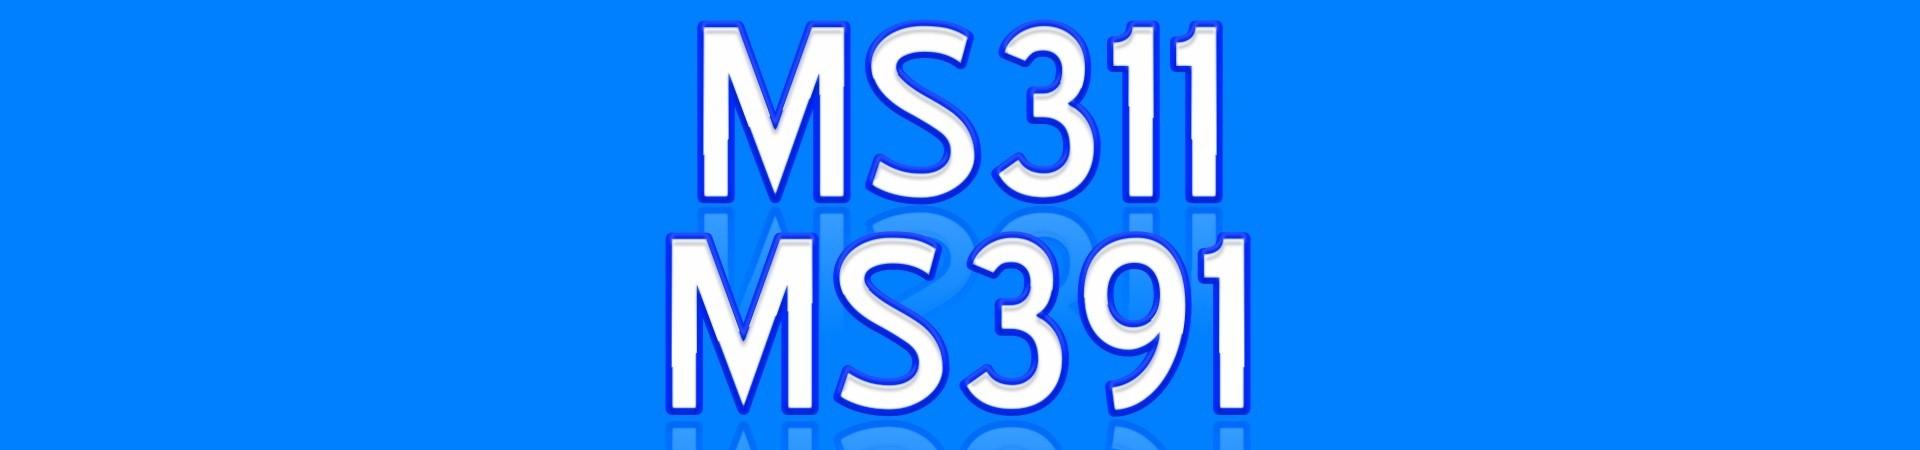 REPUESTOS para Motosierra STIHL MS311 MS391